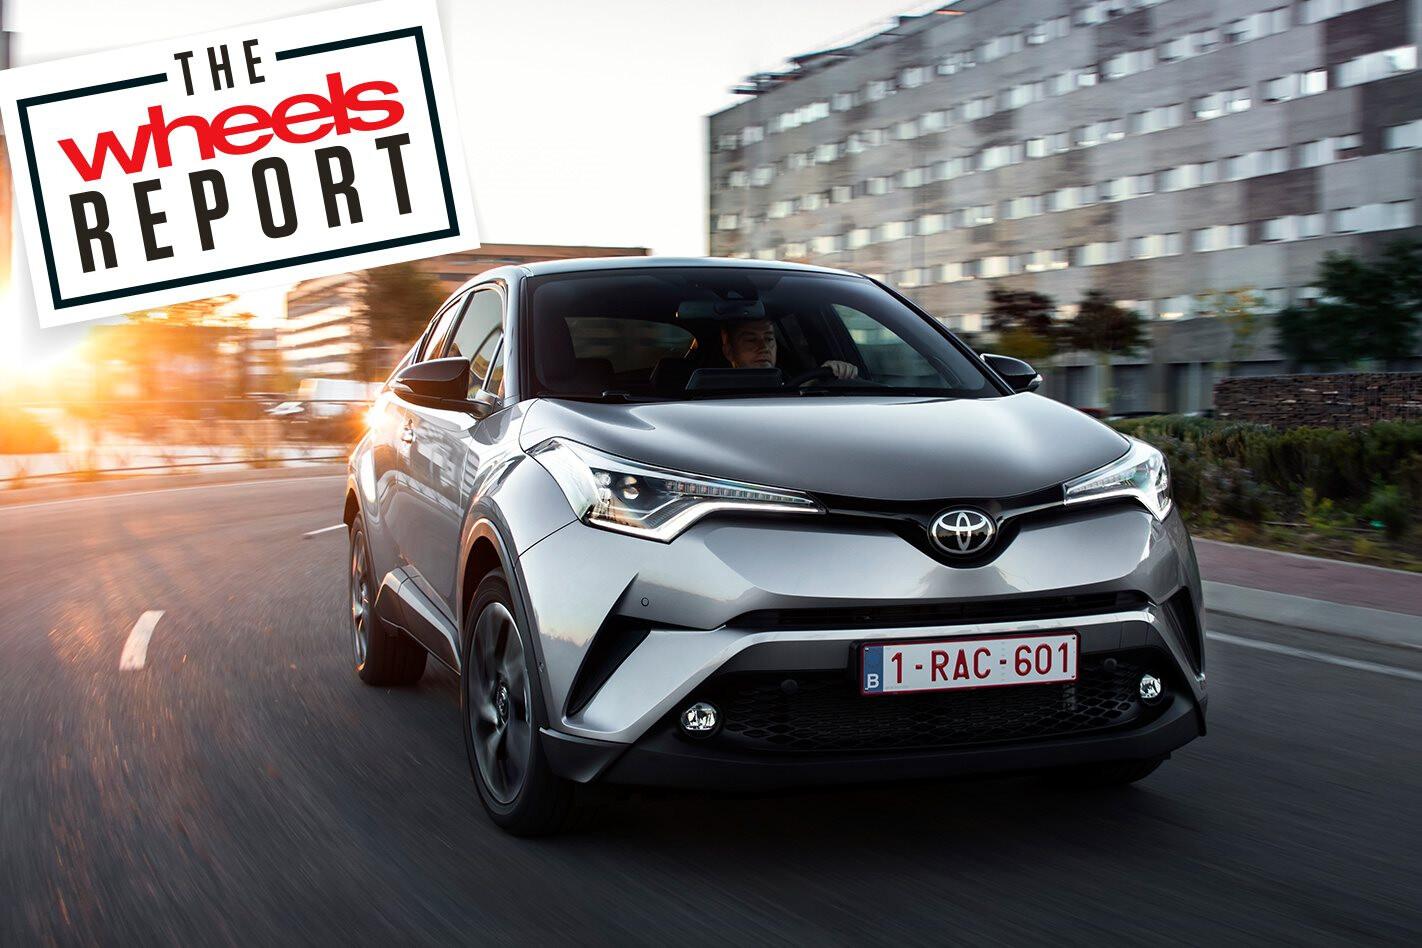 Toyota Wheels Report 2016